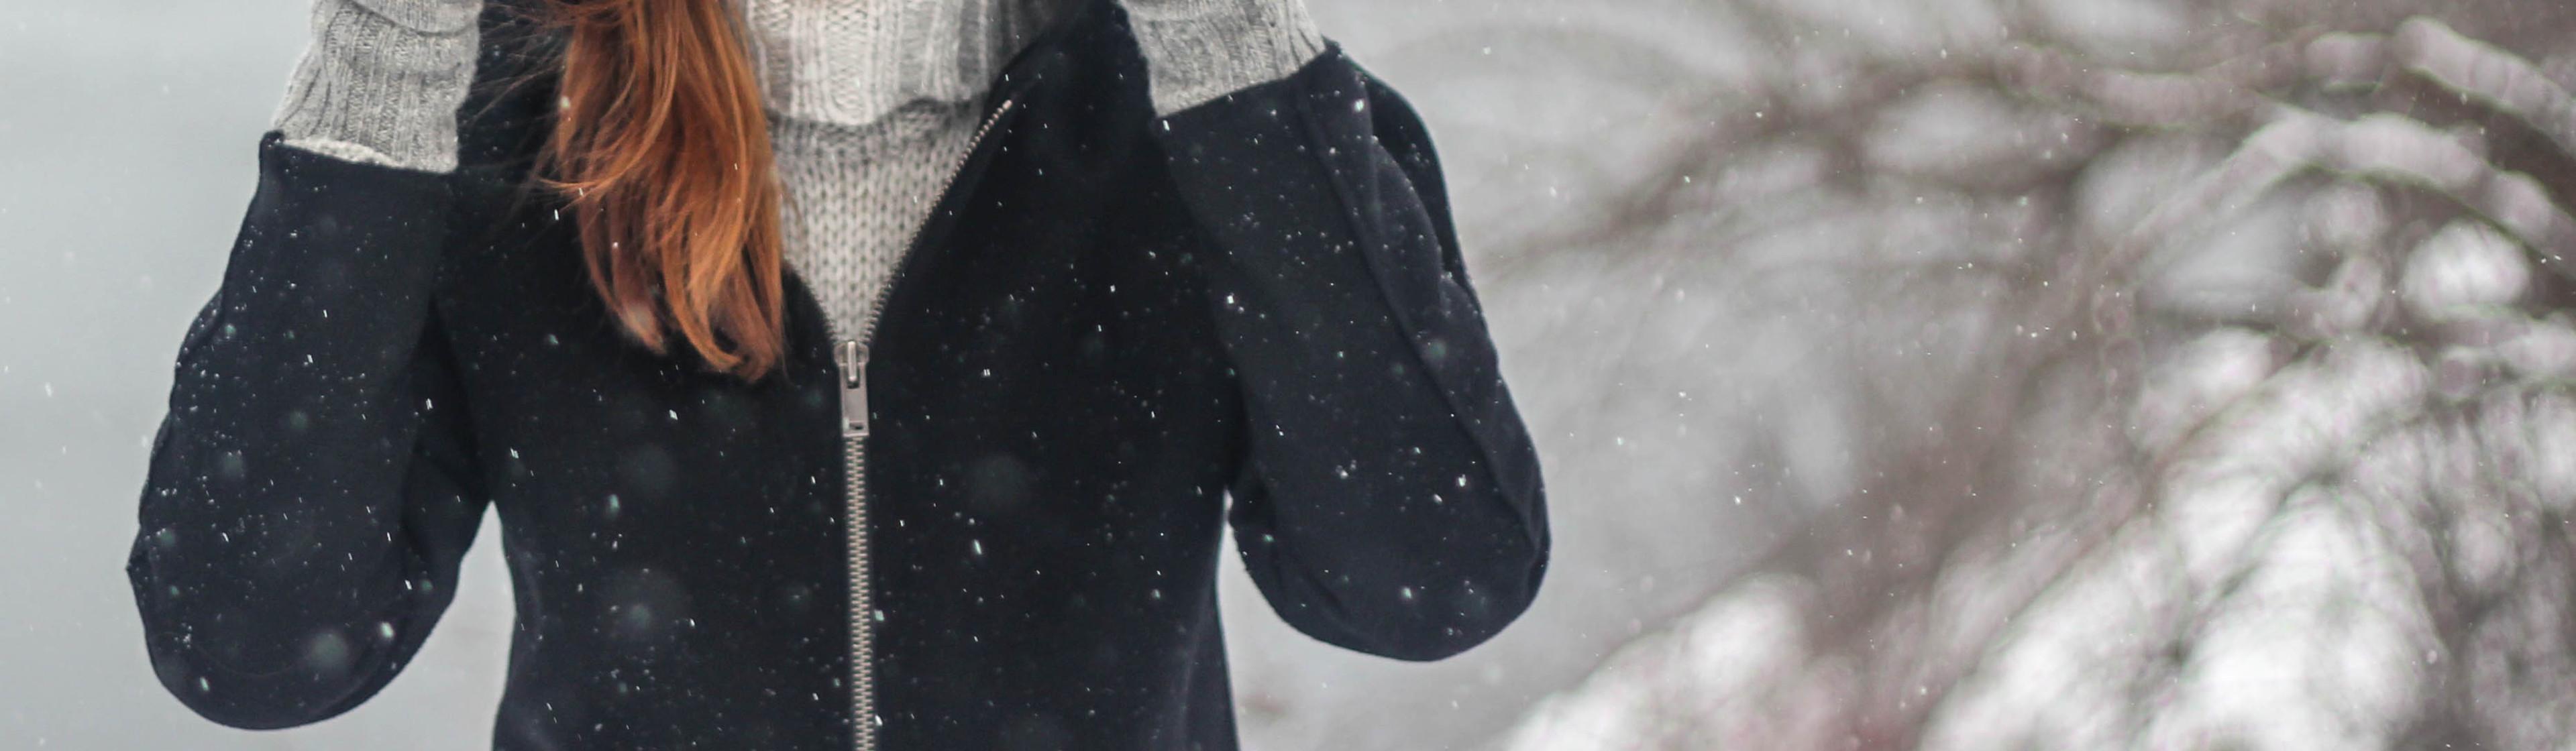 Style Guide: Women's Winter Coats